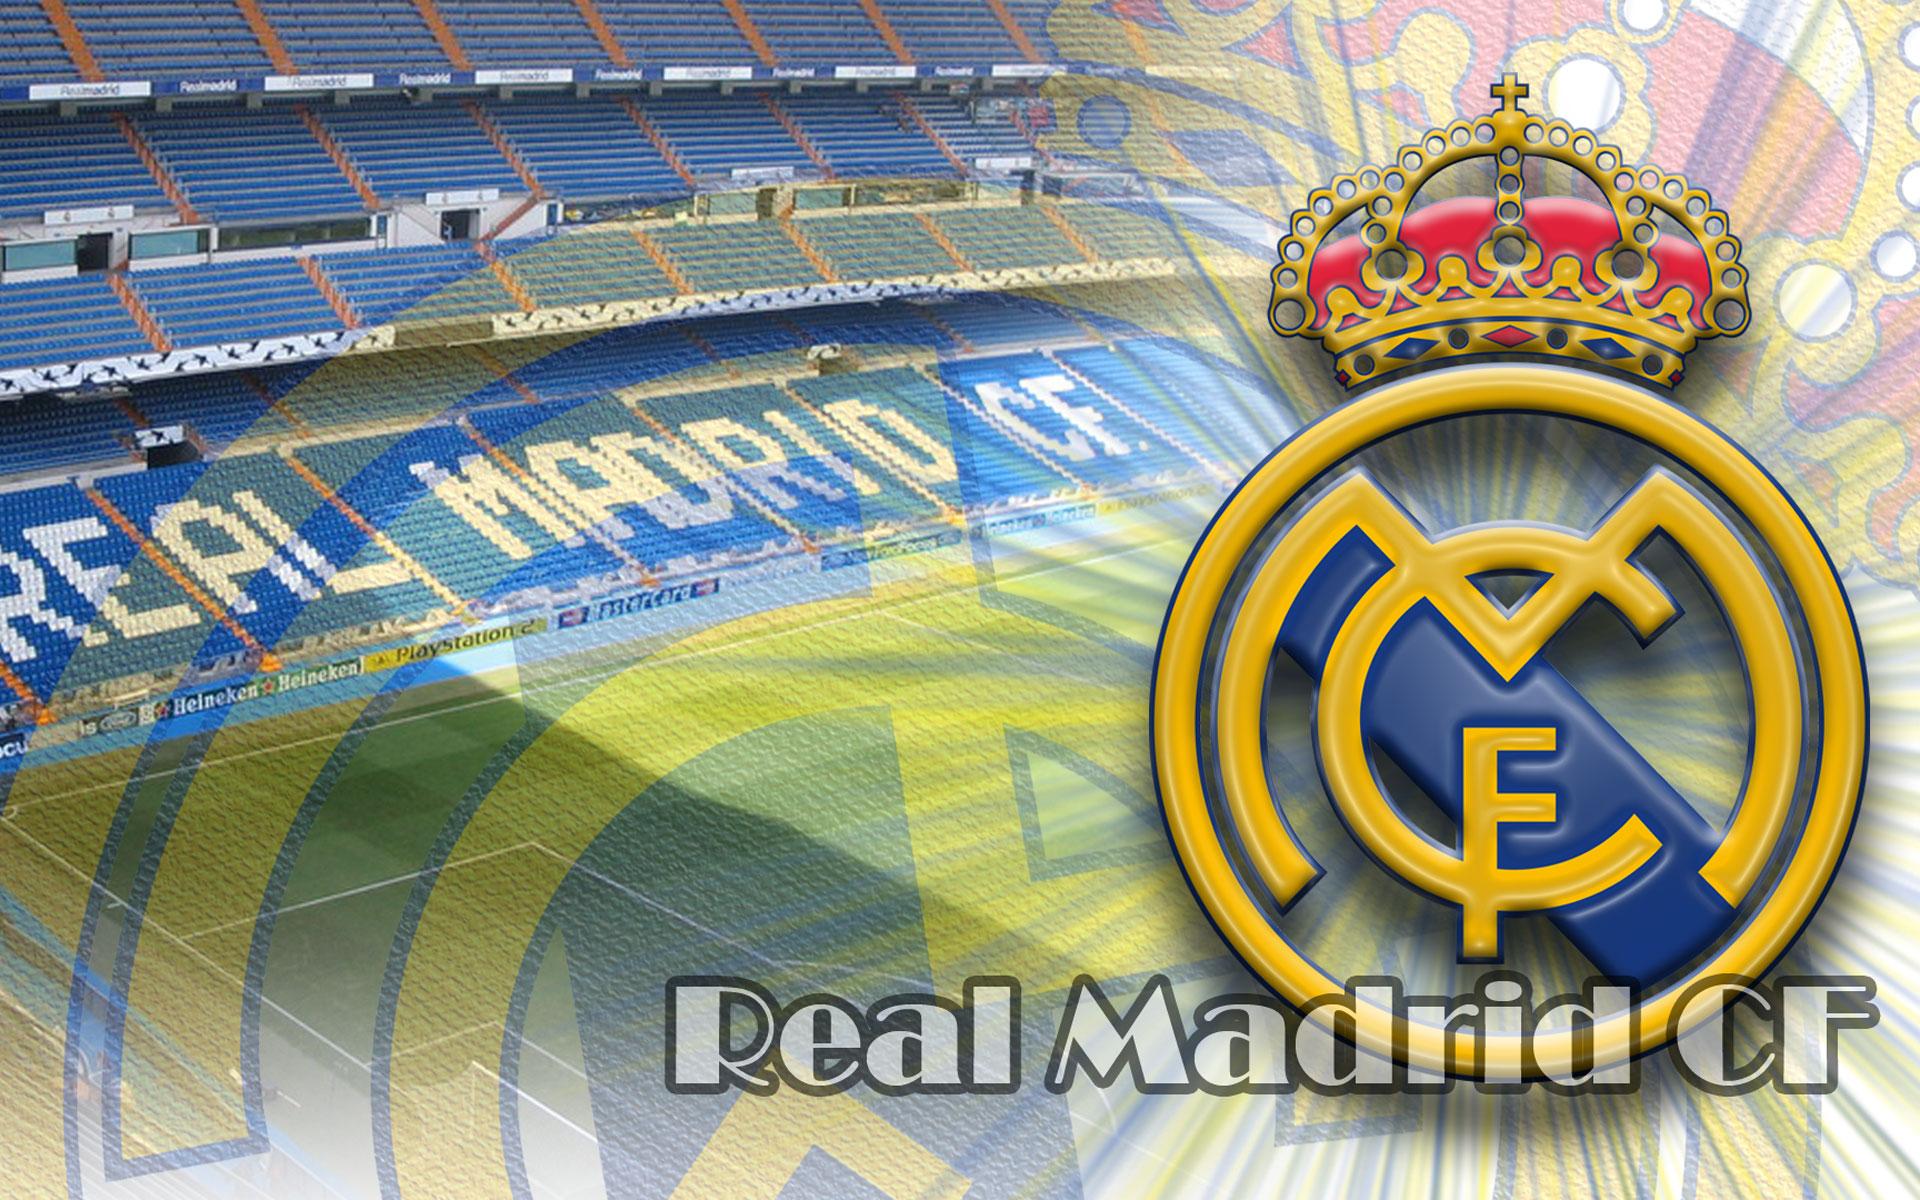 Fondos De Pantalla Del Real Madrid Wallpapers Gratis